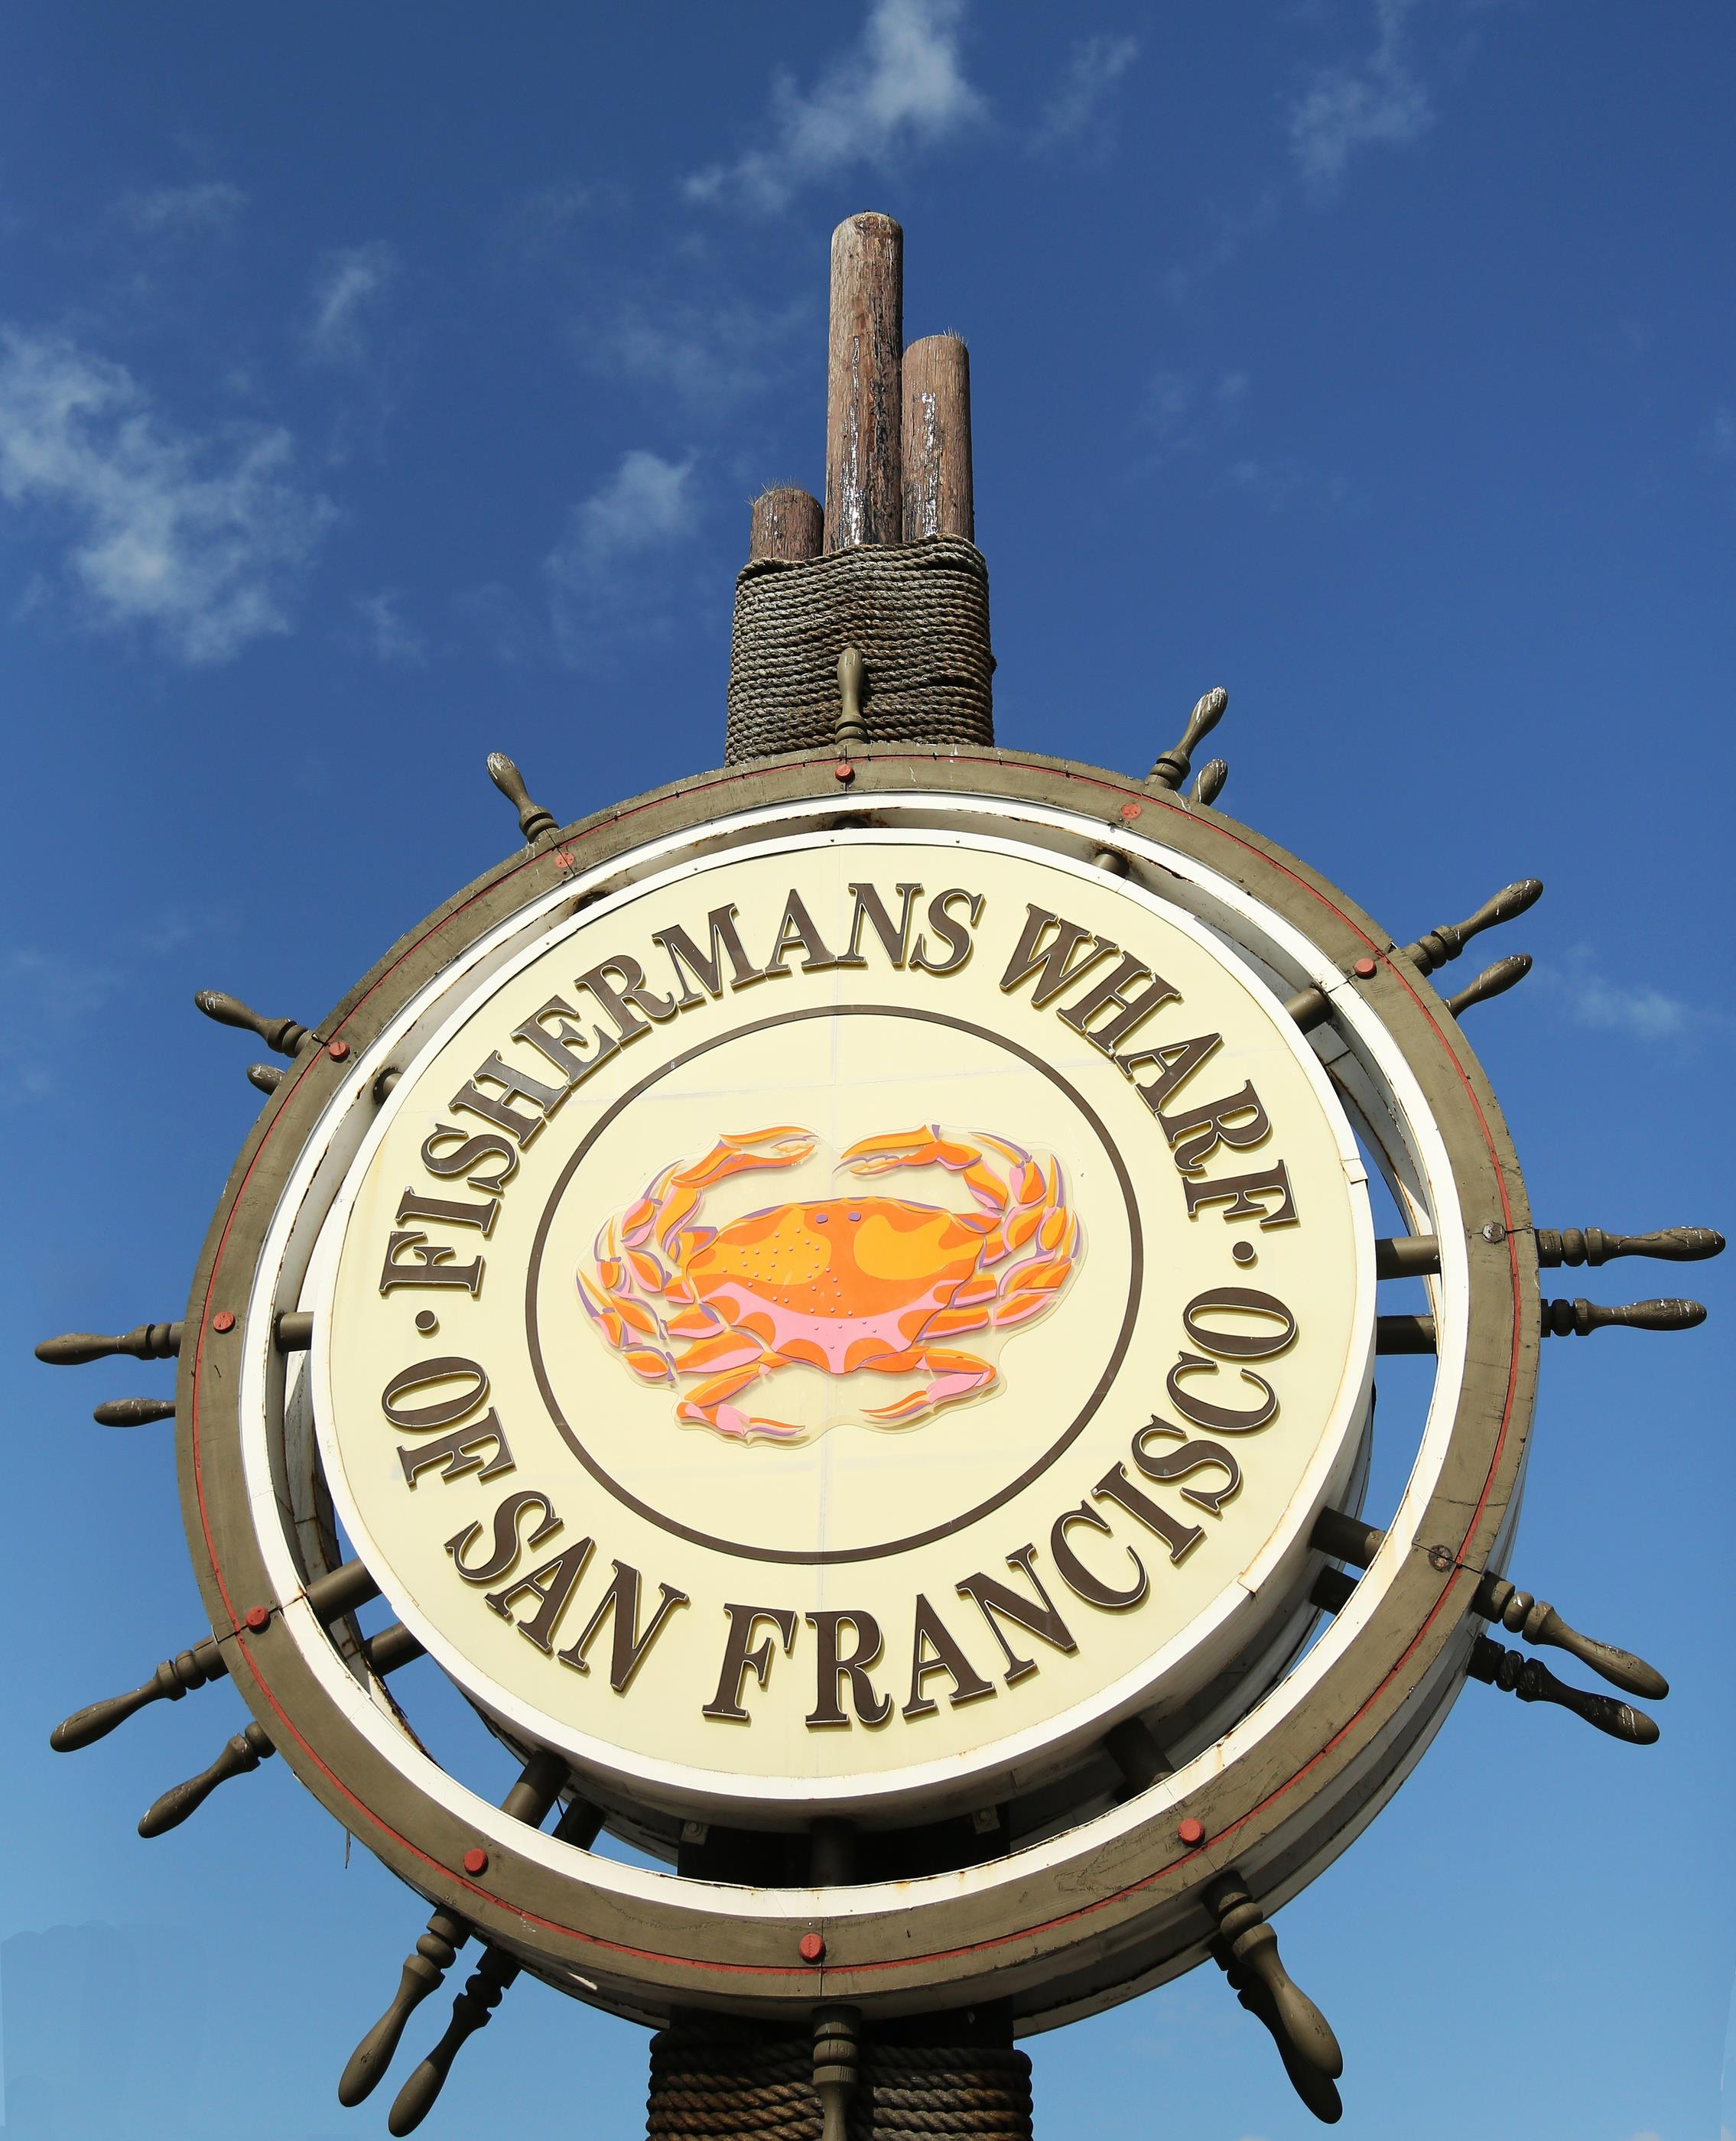 Trip Advisor San Francisco Hotel: Sheraton Fisherman's Wharf Hotel, San Francisco California